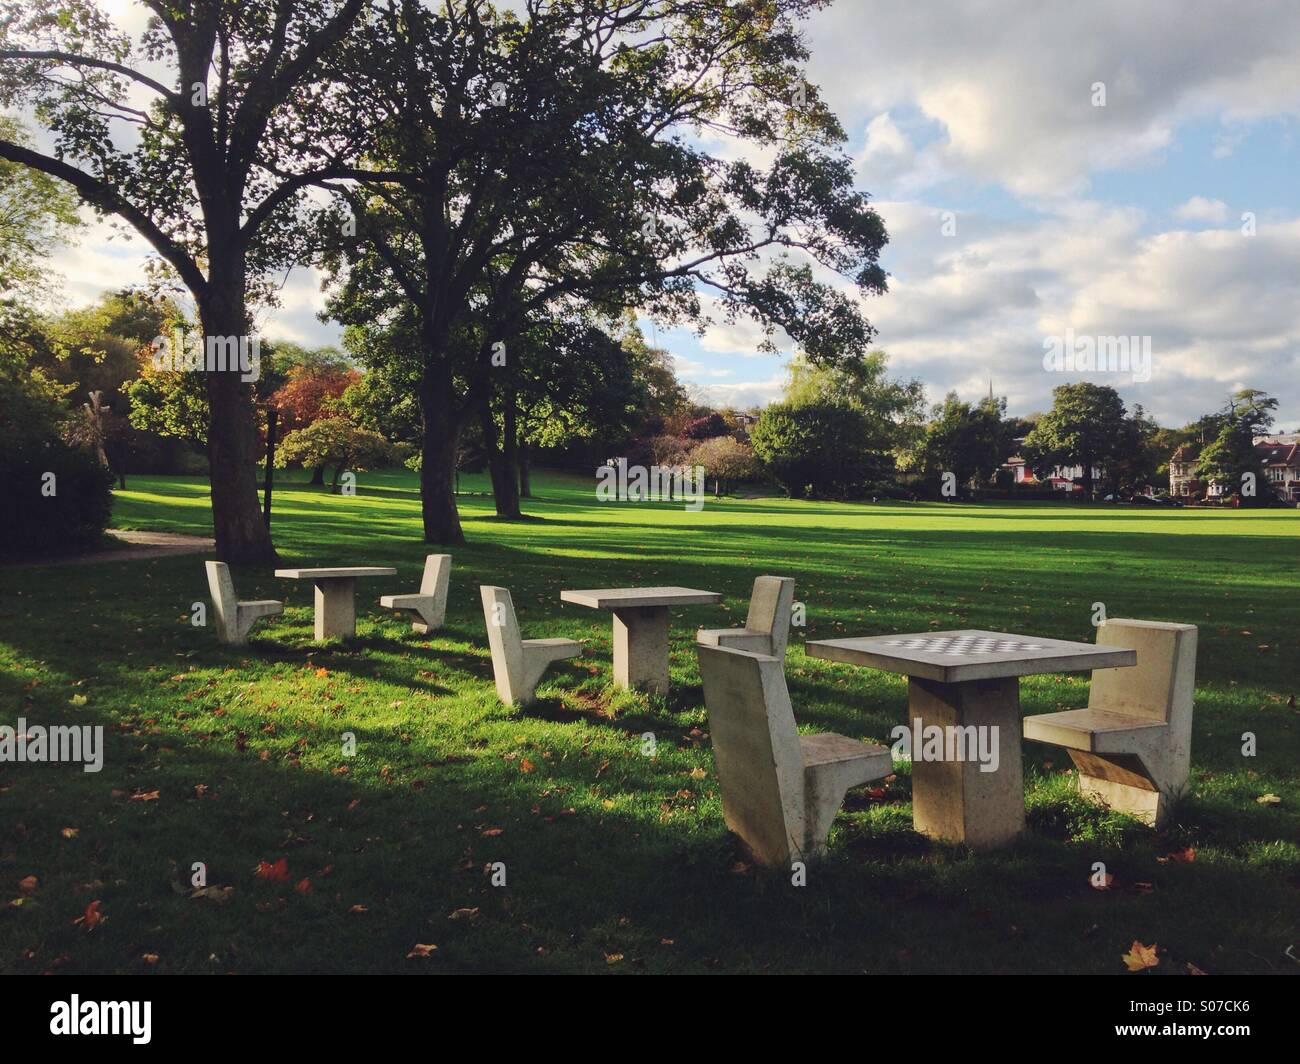 Public chess tables at Springfield Park, Hackney. - Stock Image